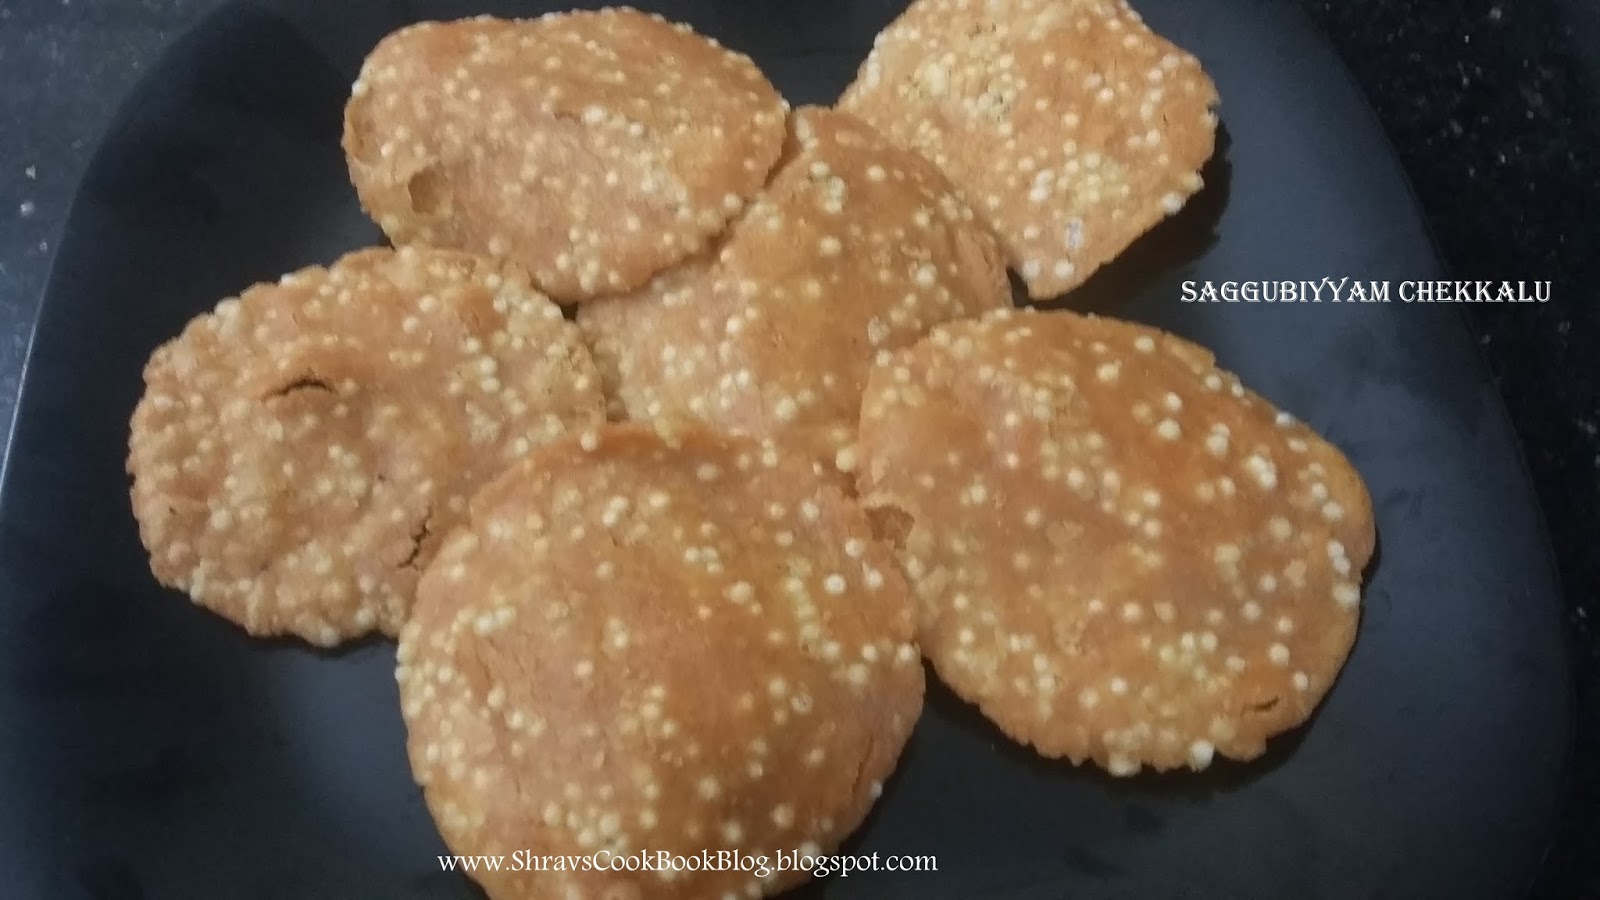 Healthy recipes saggubiyyam chekkalu recipe nippattu thattai saggubiyyam chekkalu nippattu recipe in kannada forumfinder Images